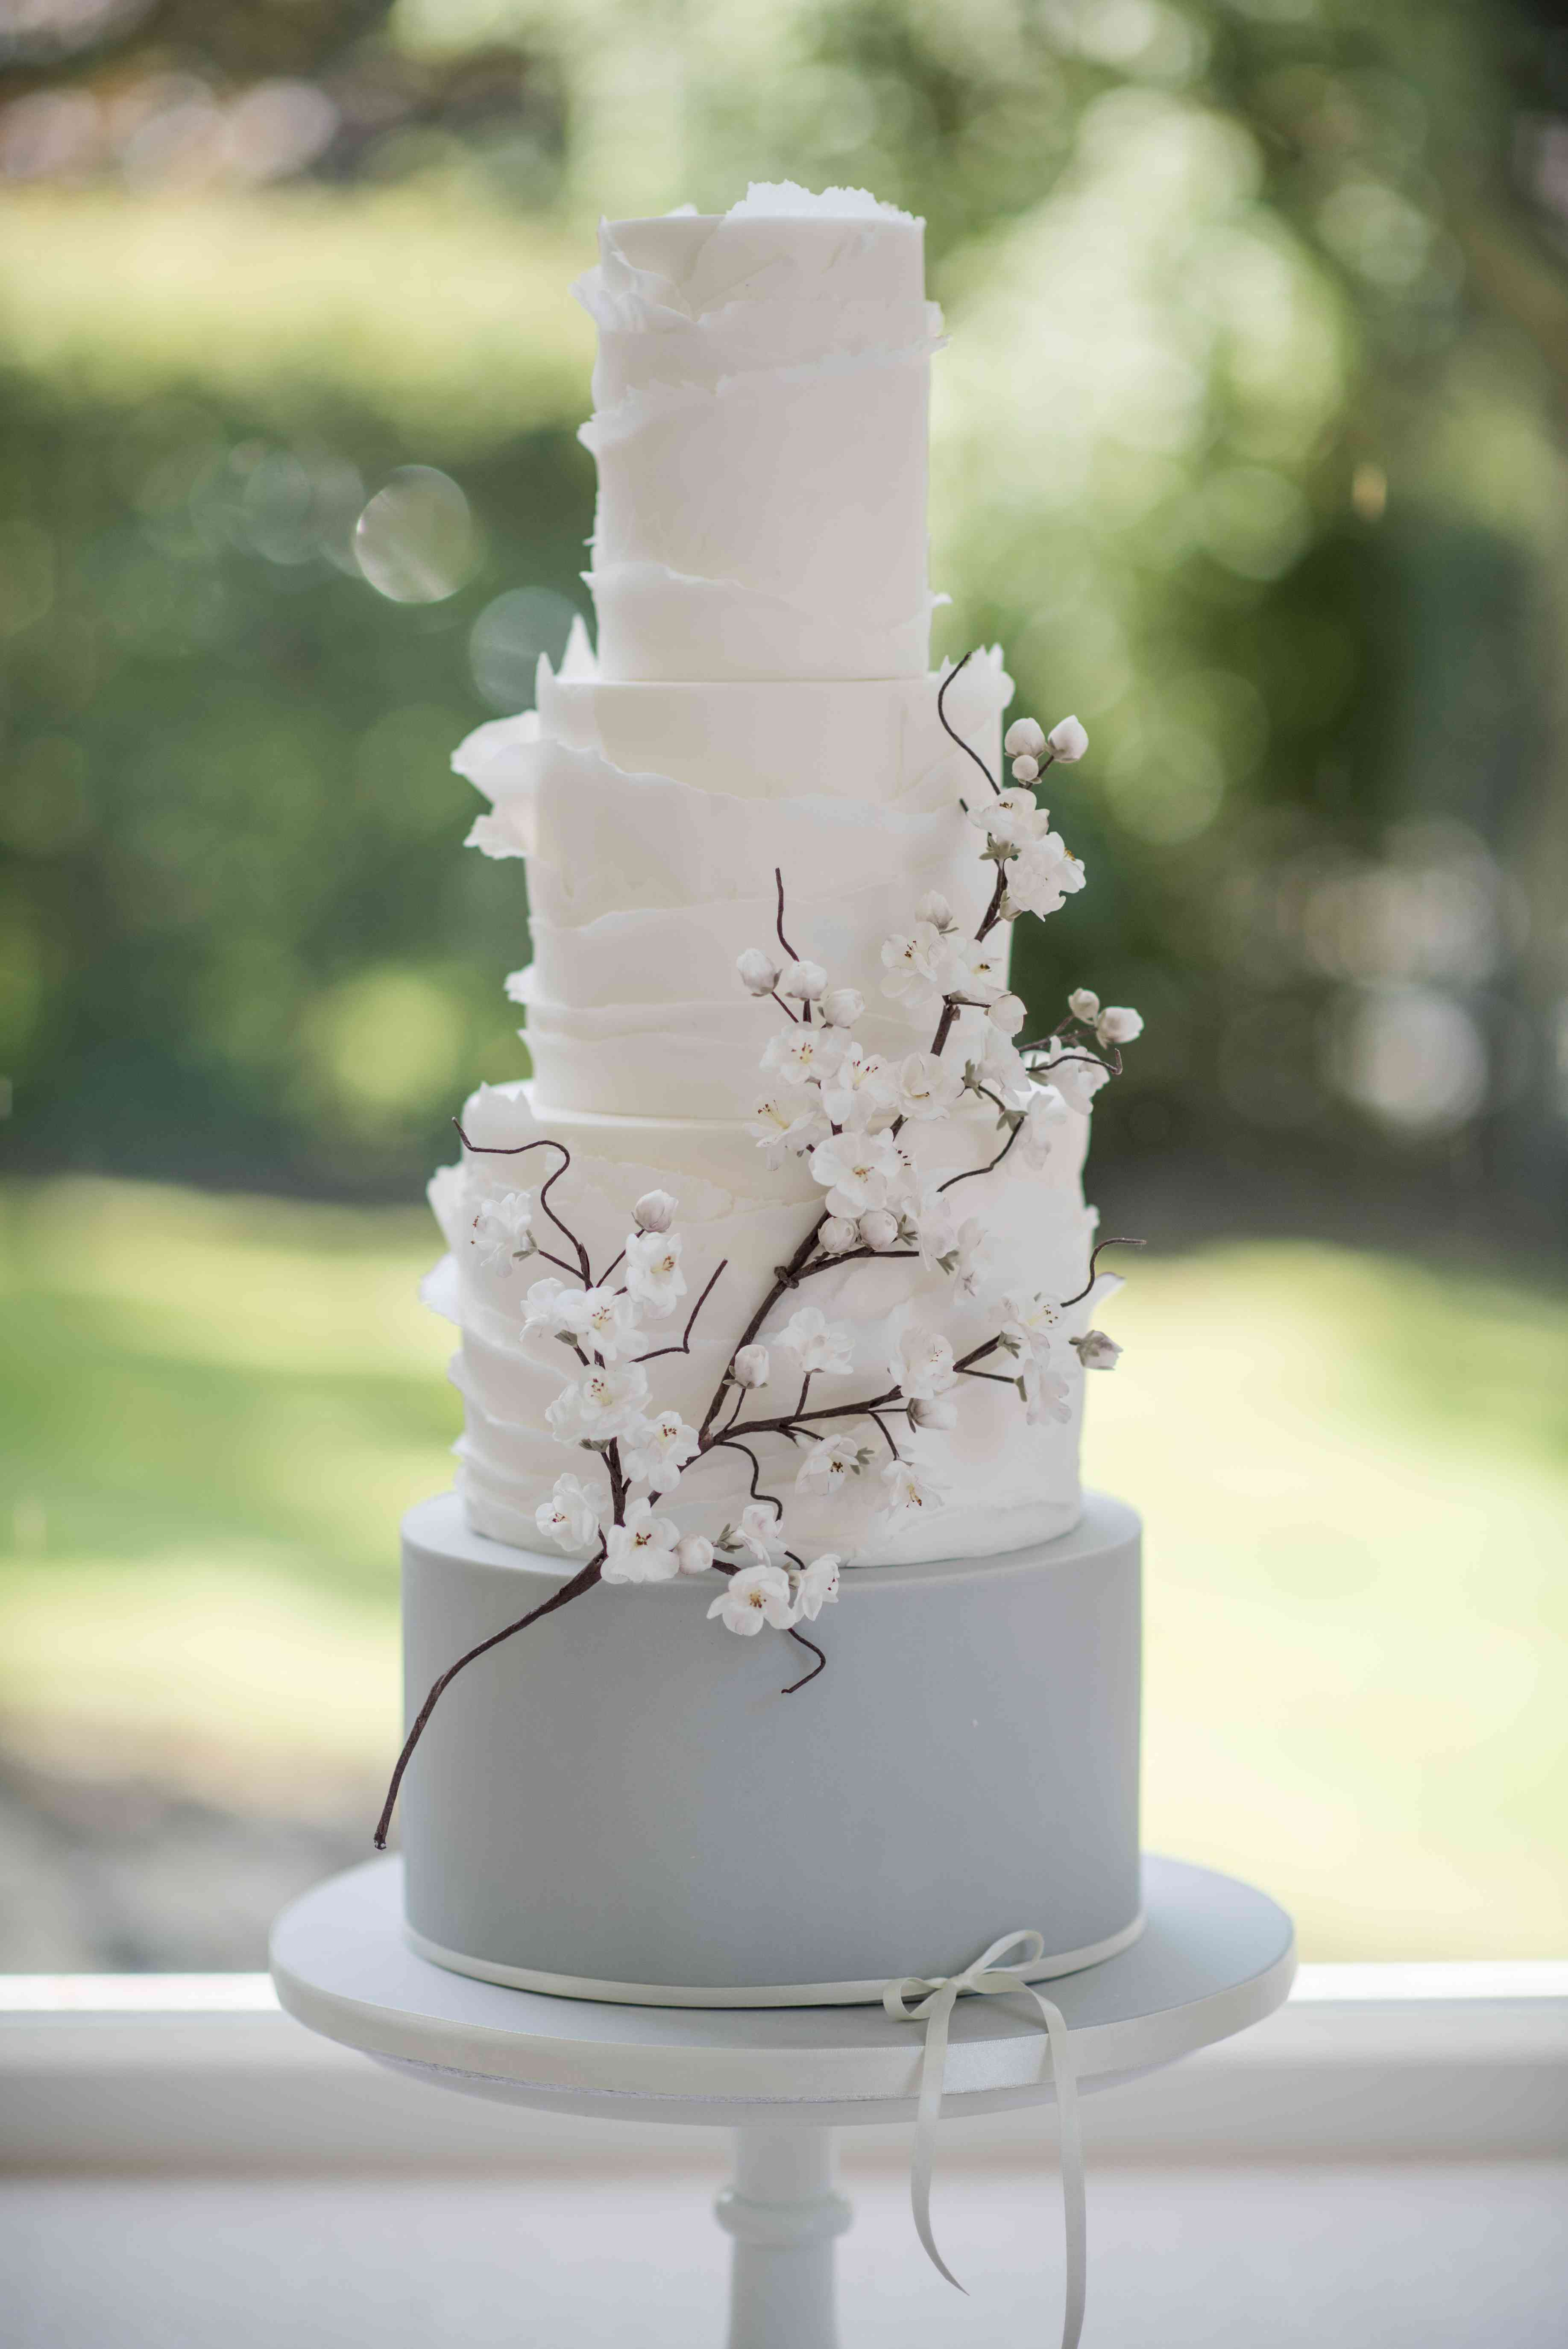 white and gray cherry blossom cake